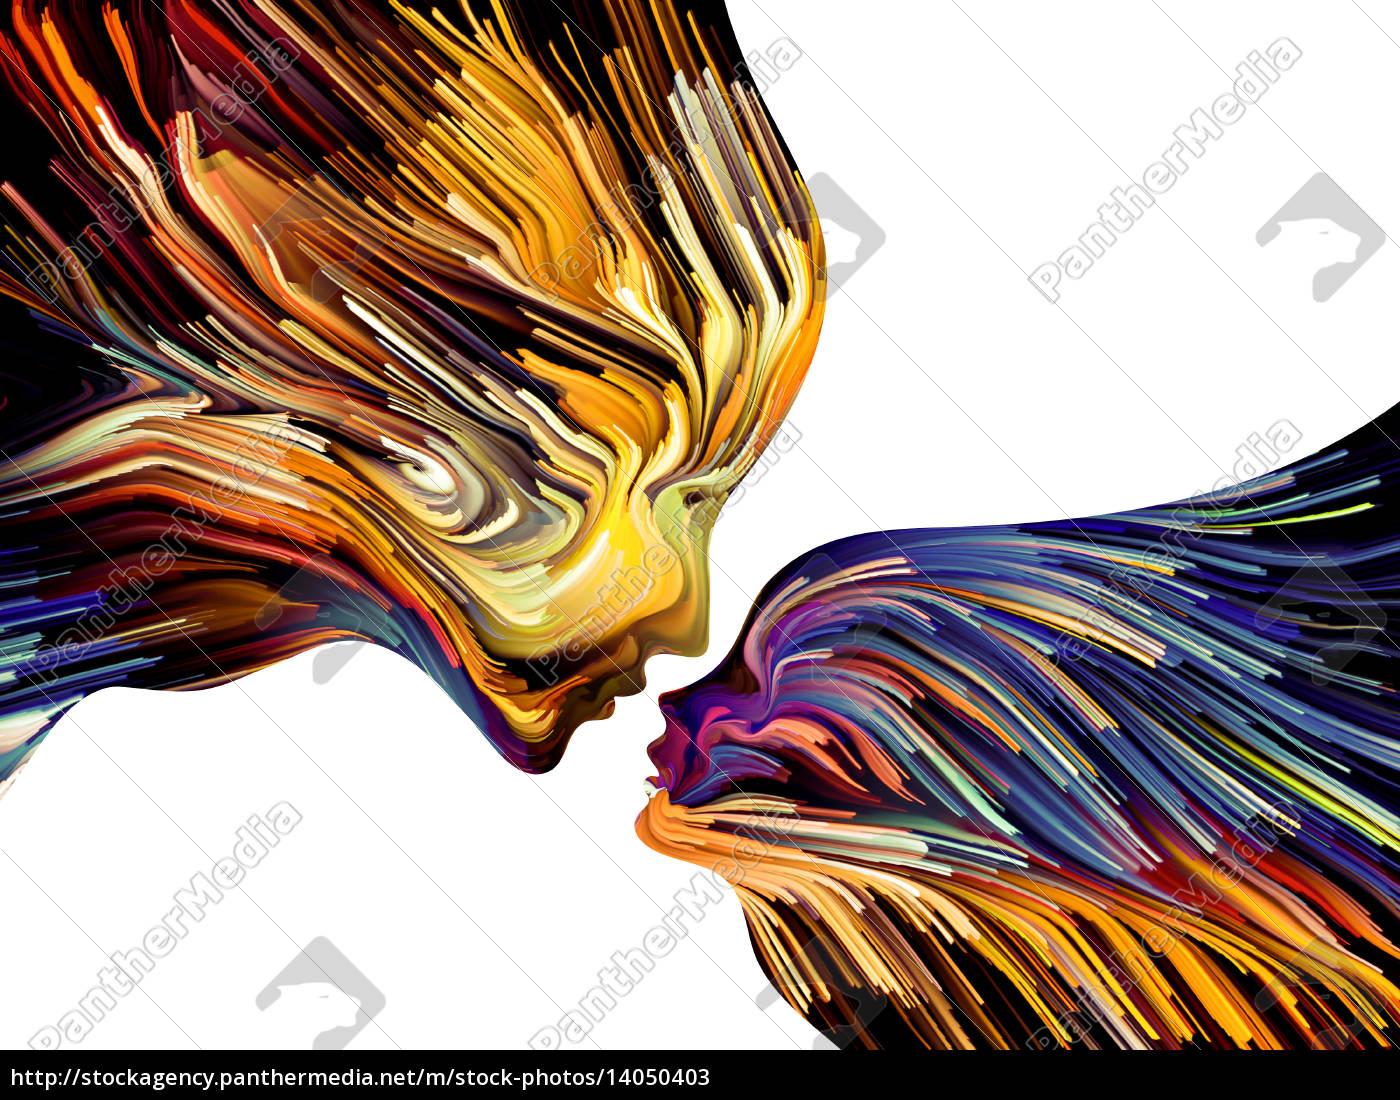 metaphorical, mind, painting - 14050403